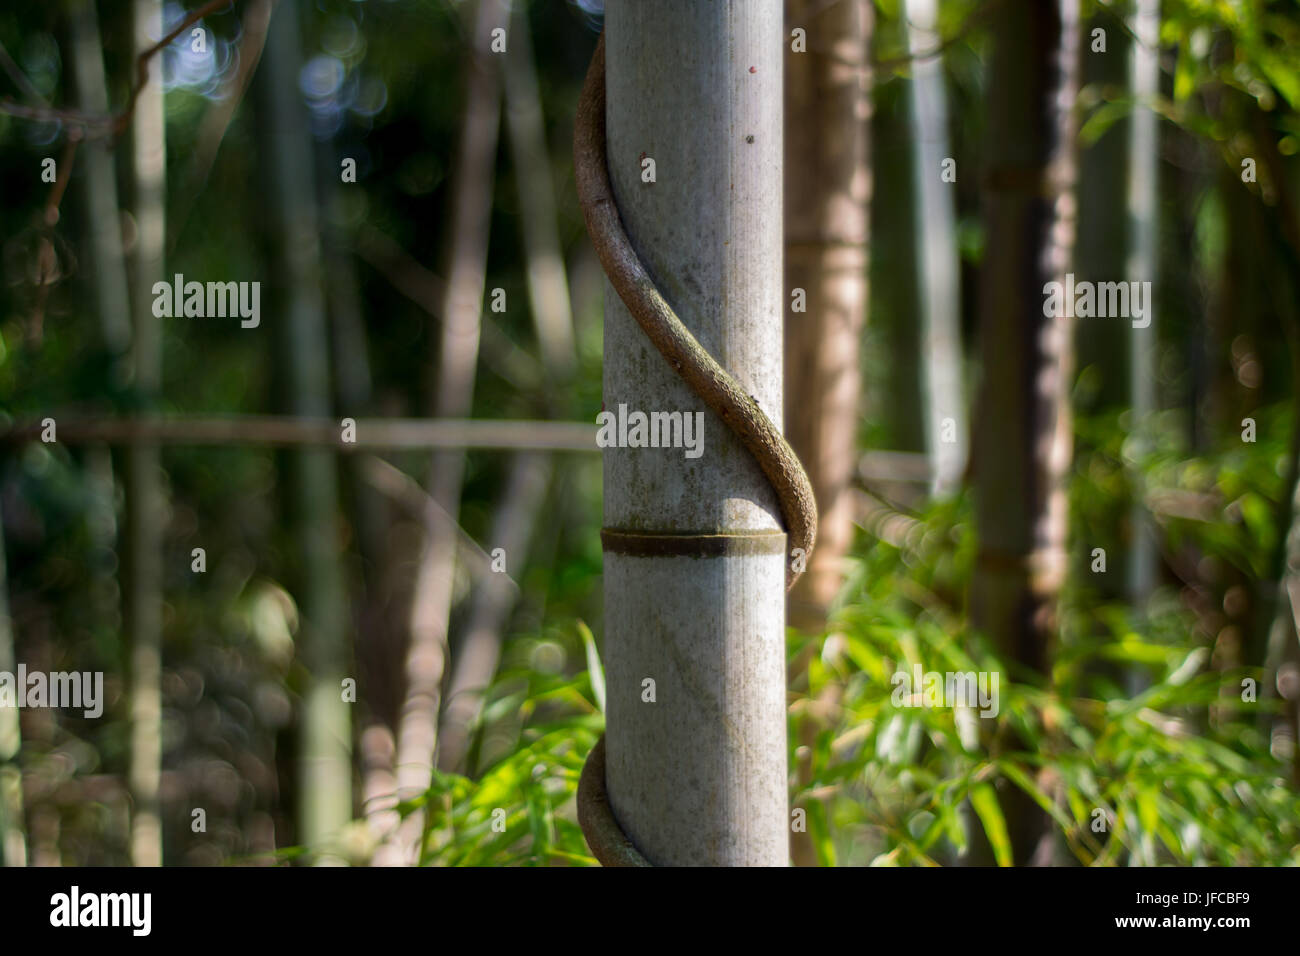 Bamboo with spiraling vine in Hakone, Ashigarashimo District, Kanagawa Prefecture, Japan - Stock Image